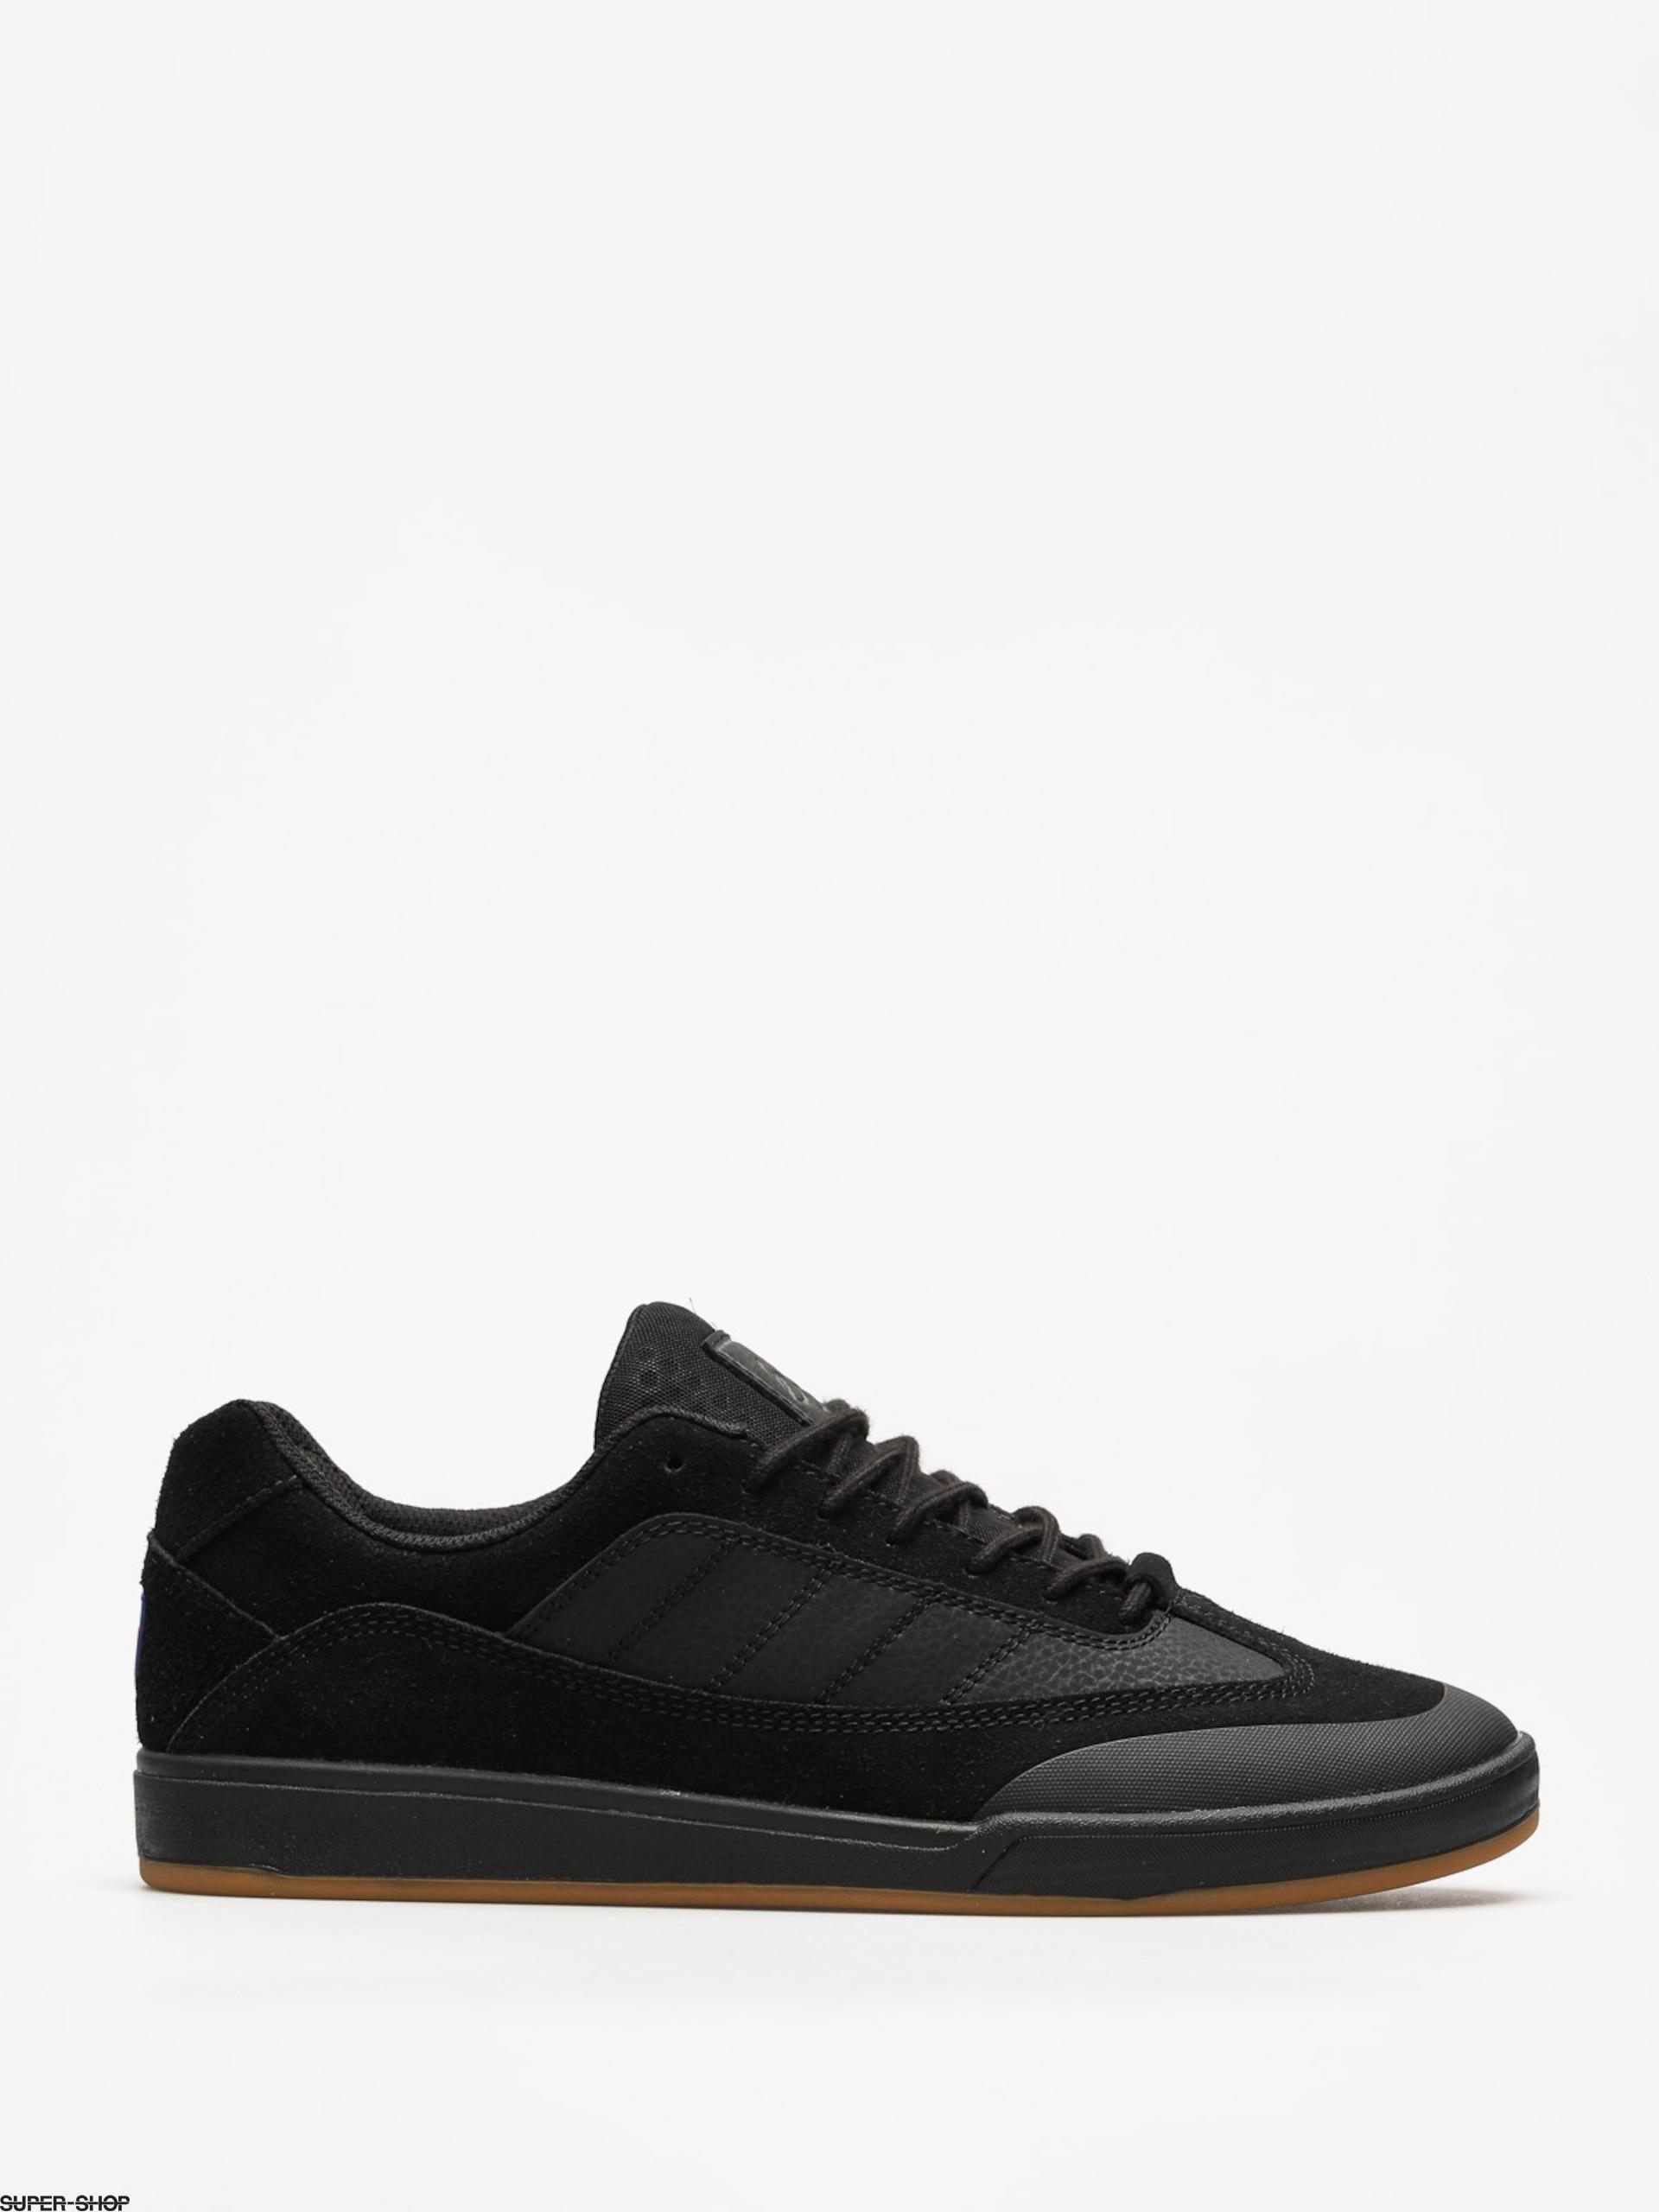 finest selection 265cb 130f3 Es Schuhe Slb 97 (black/black/gum)